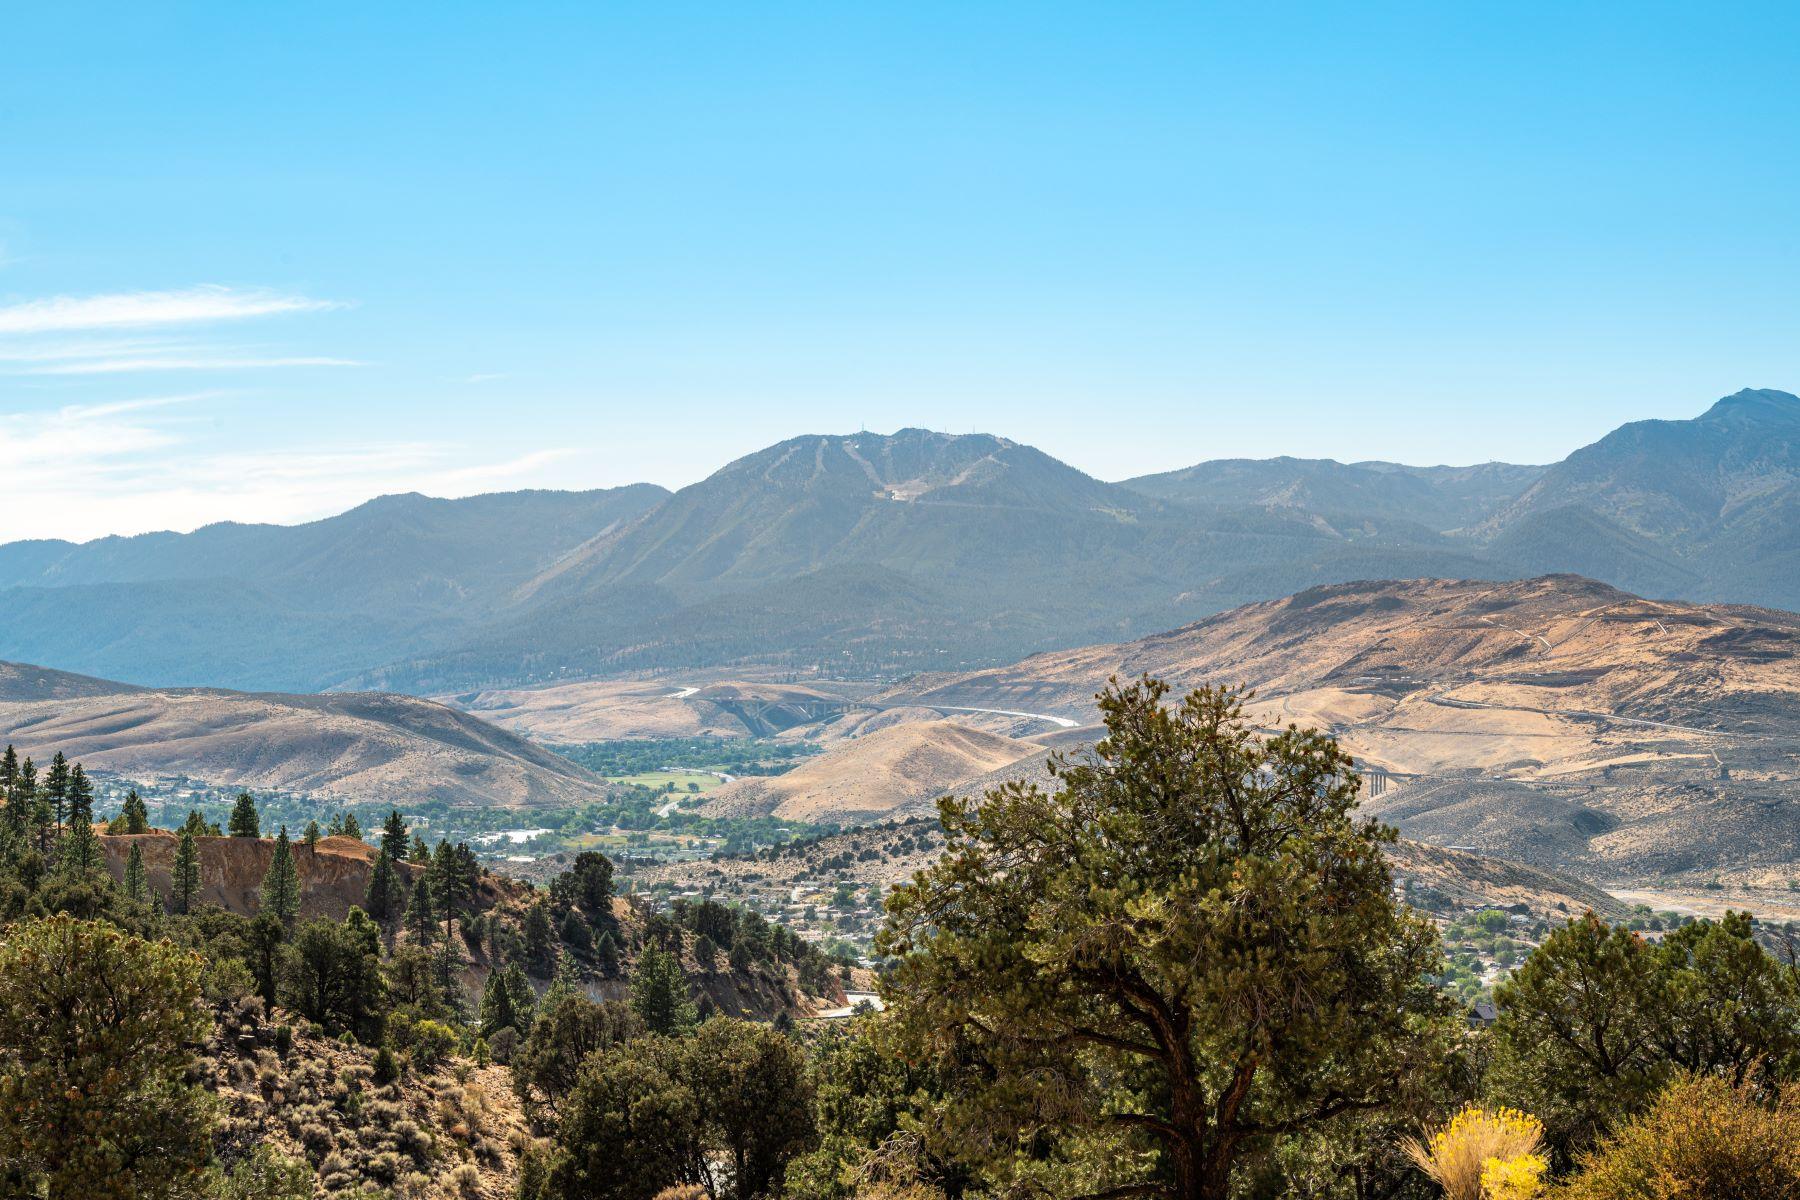 Geiger Canyon - Views and Privacy 1992 Geiger Grade Reno, Nevada 89521 Estados Unidos